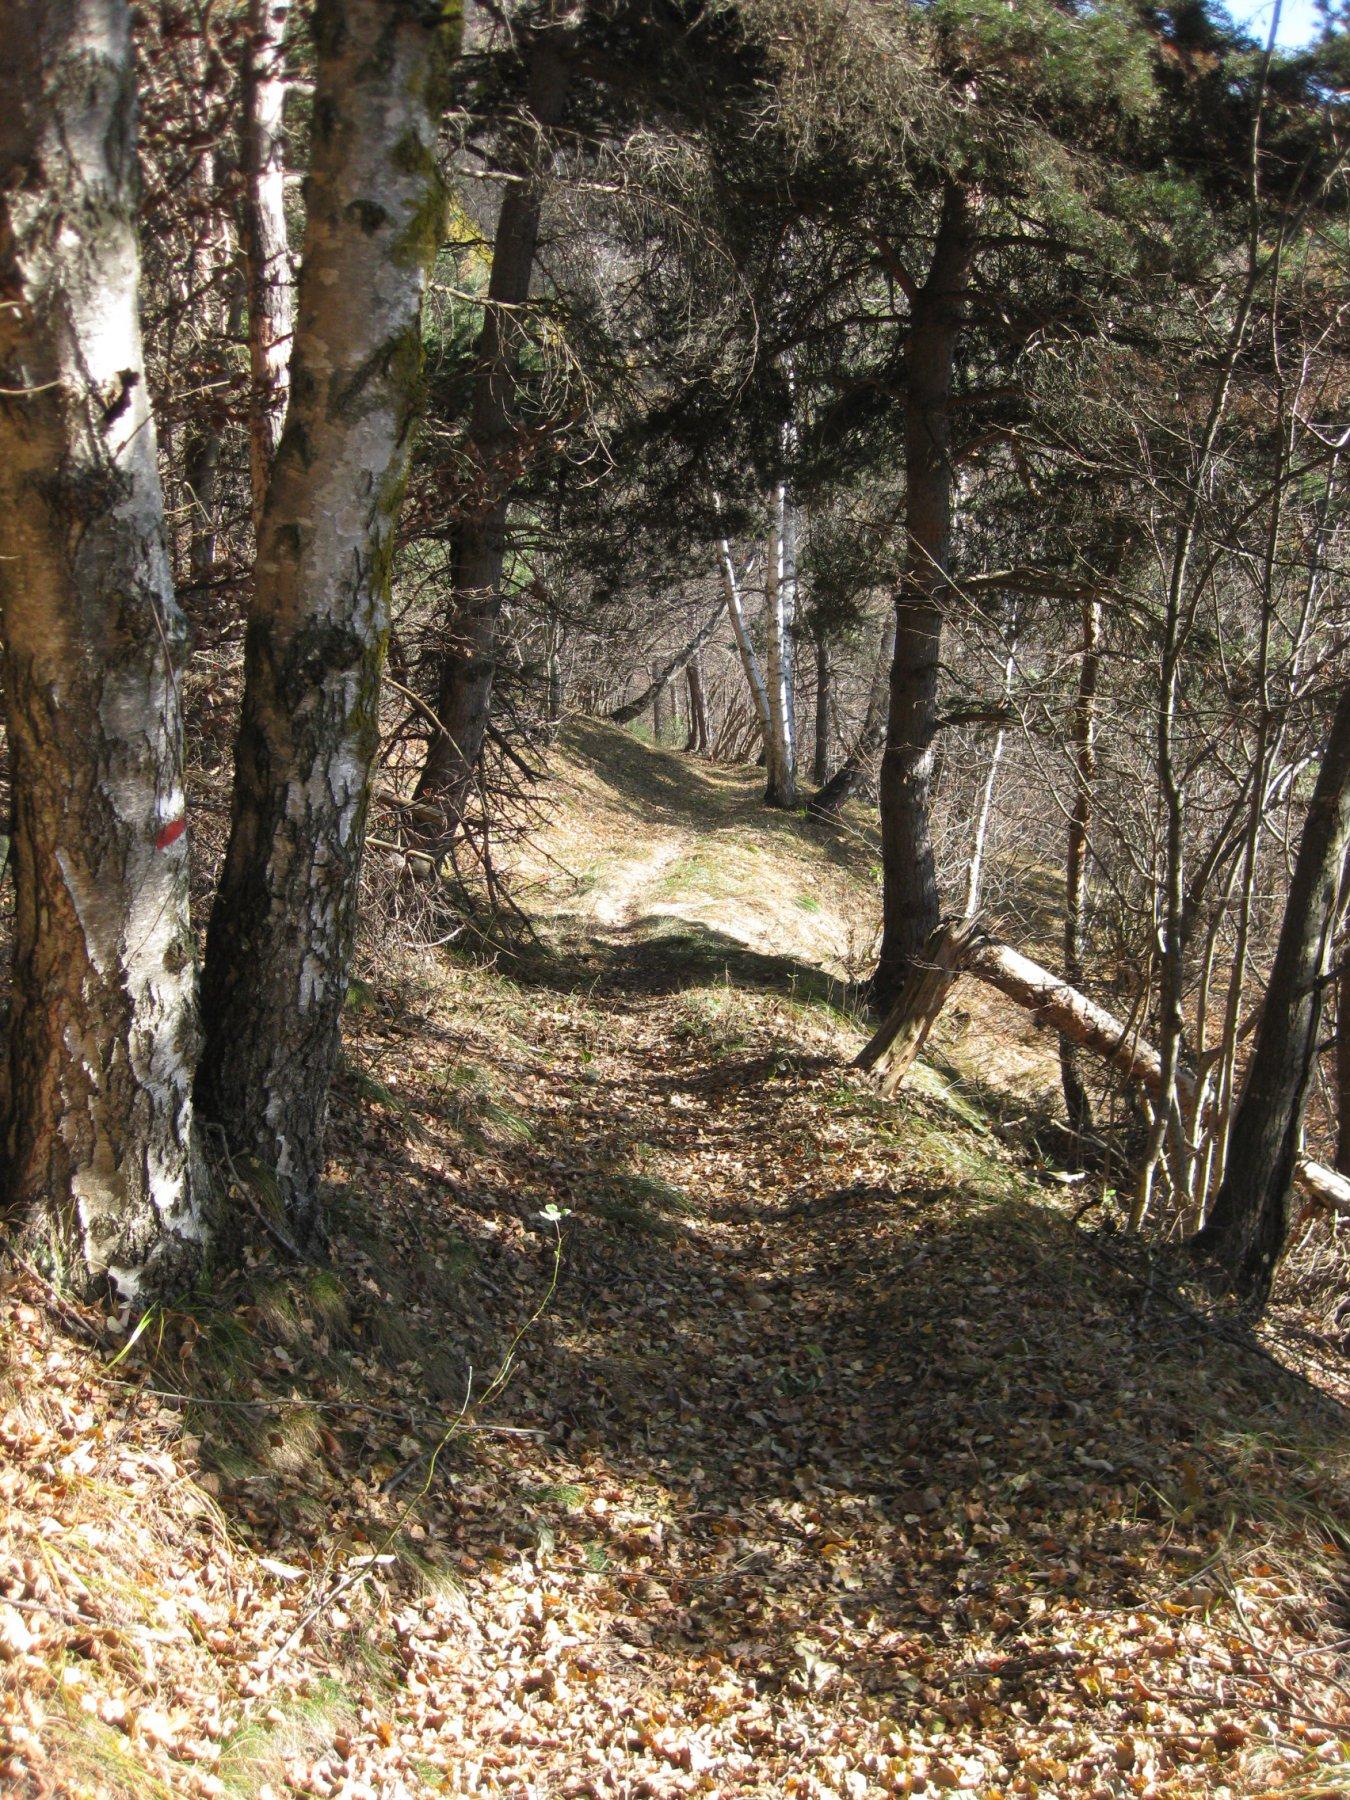 Bel sentiero nel bosco